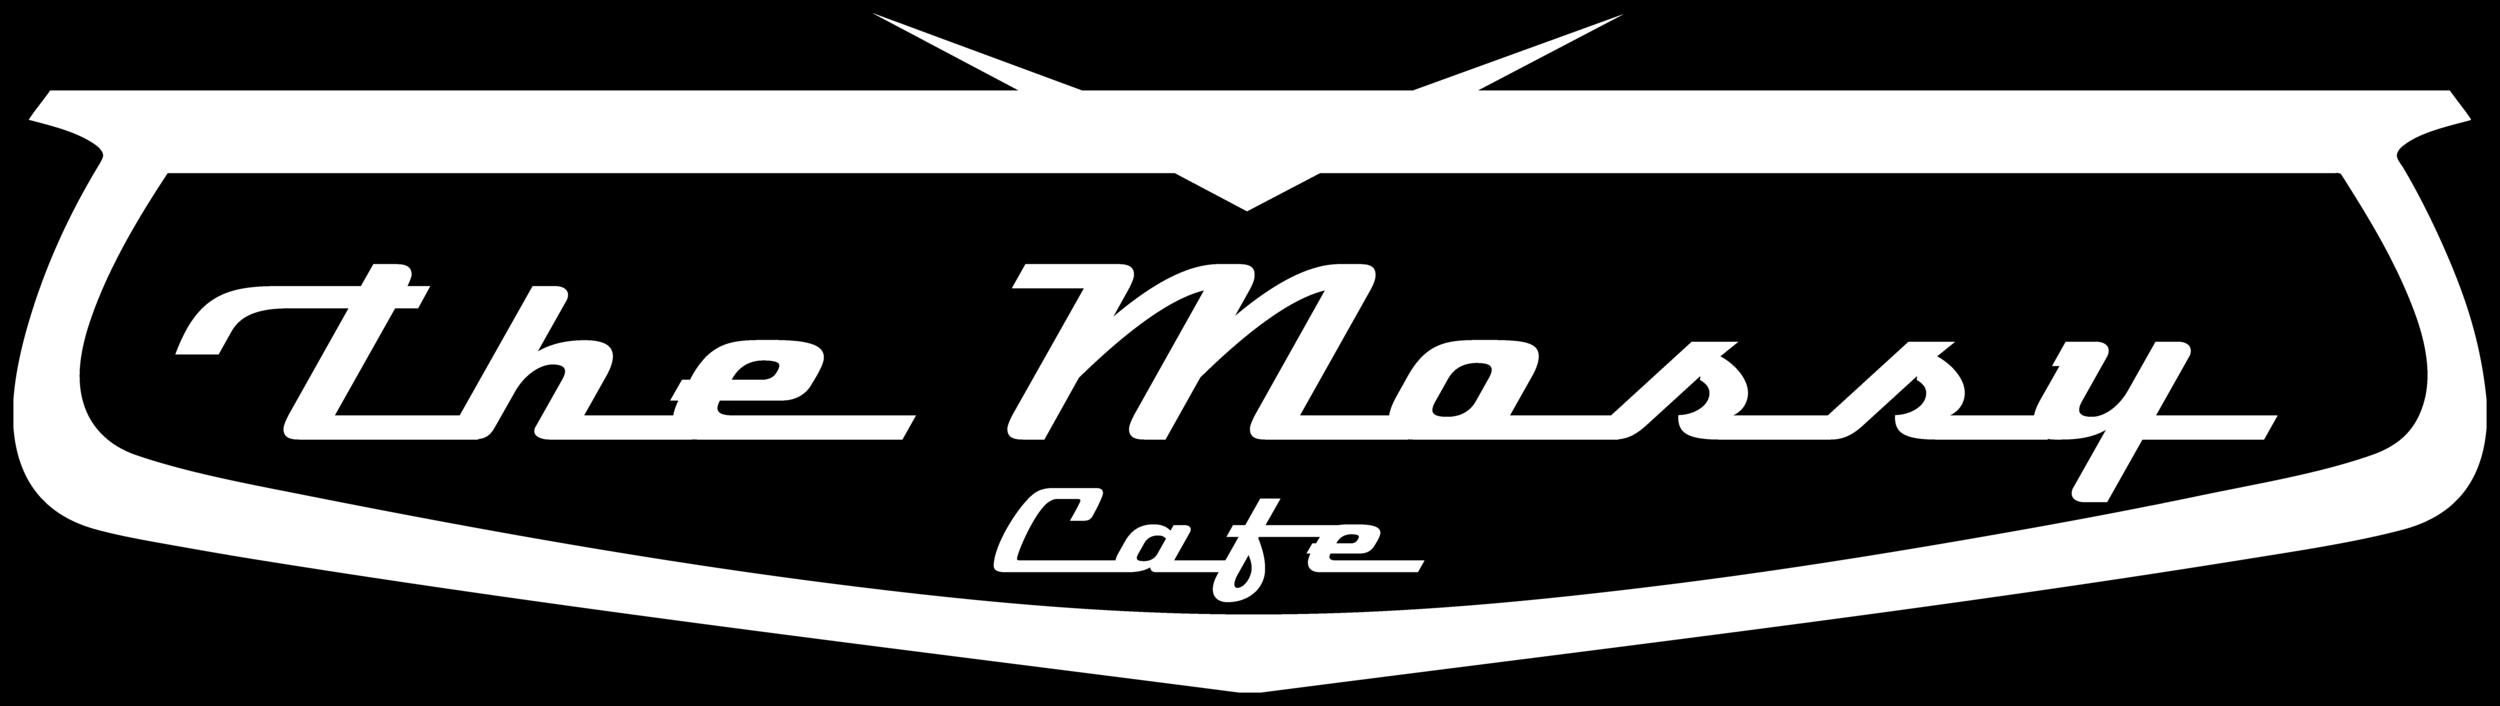 TheMossy_Logo_MonoLineWHITEBLACKOUTLINE 2.png